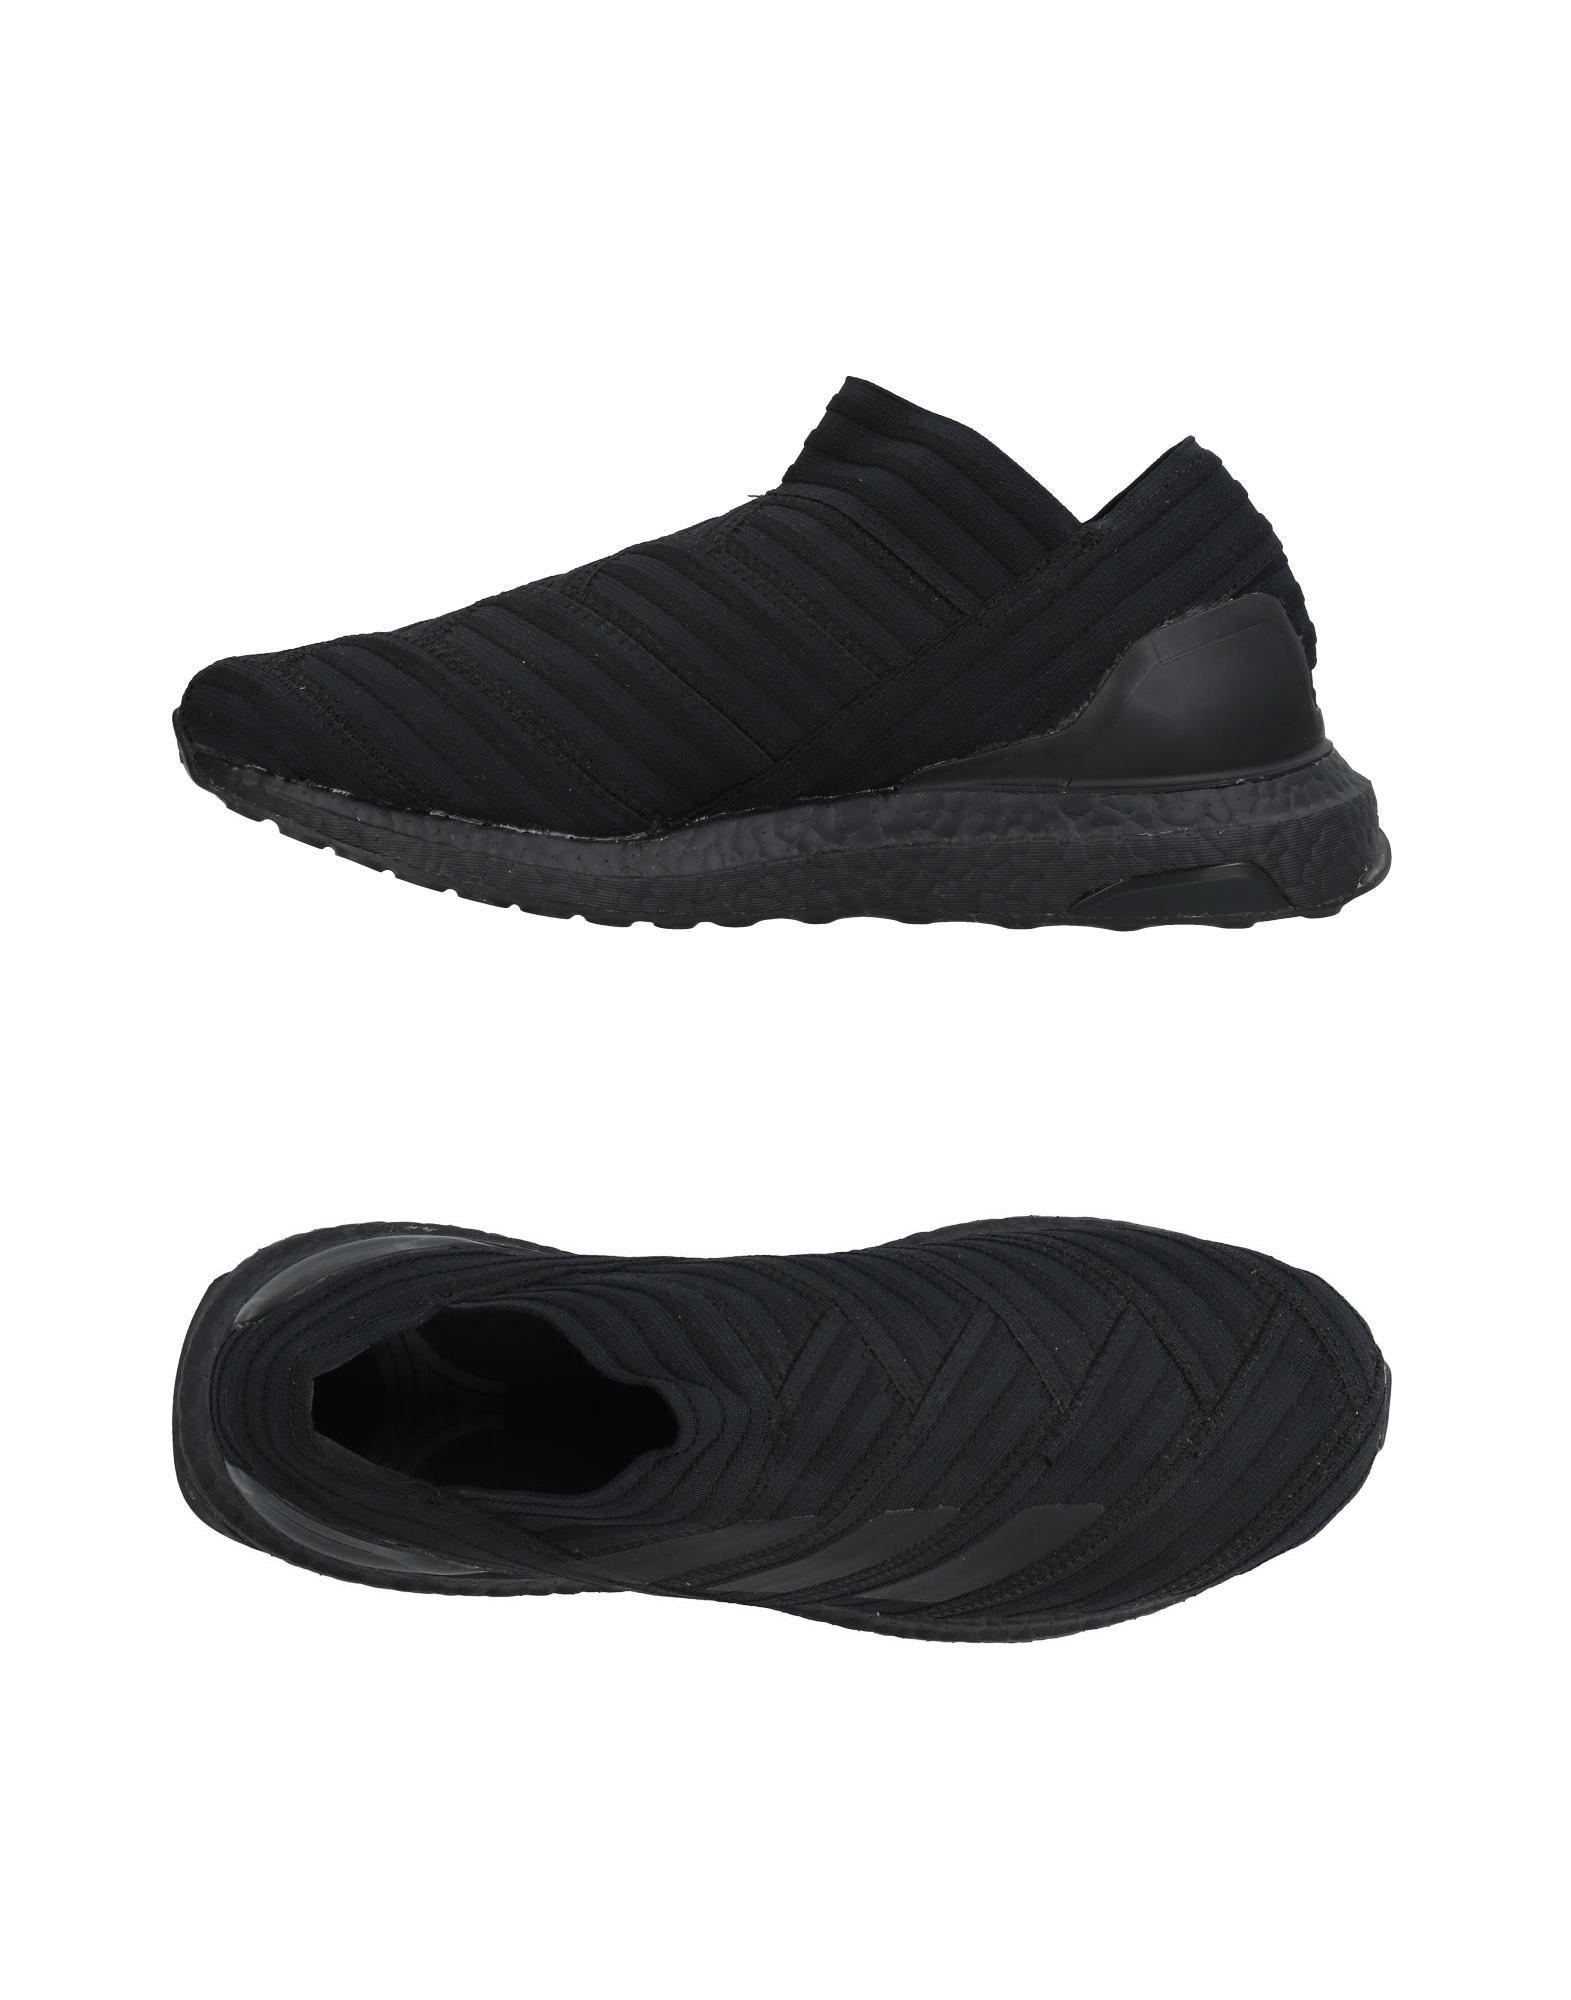 Moda Sneakers Adidas Uomo - 11452151PT